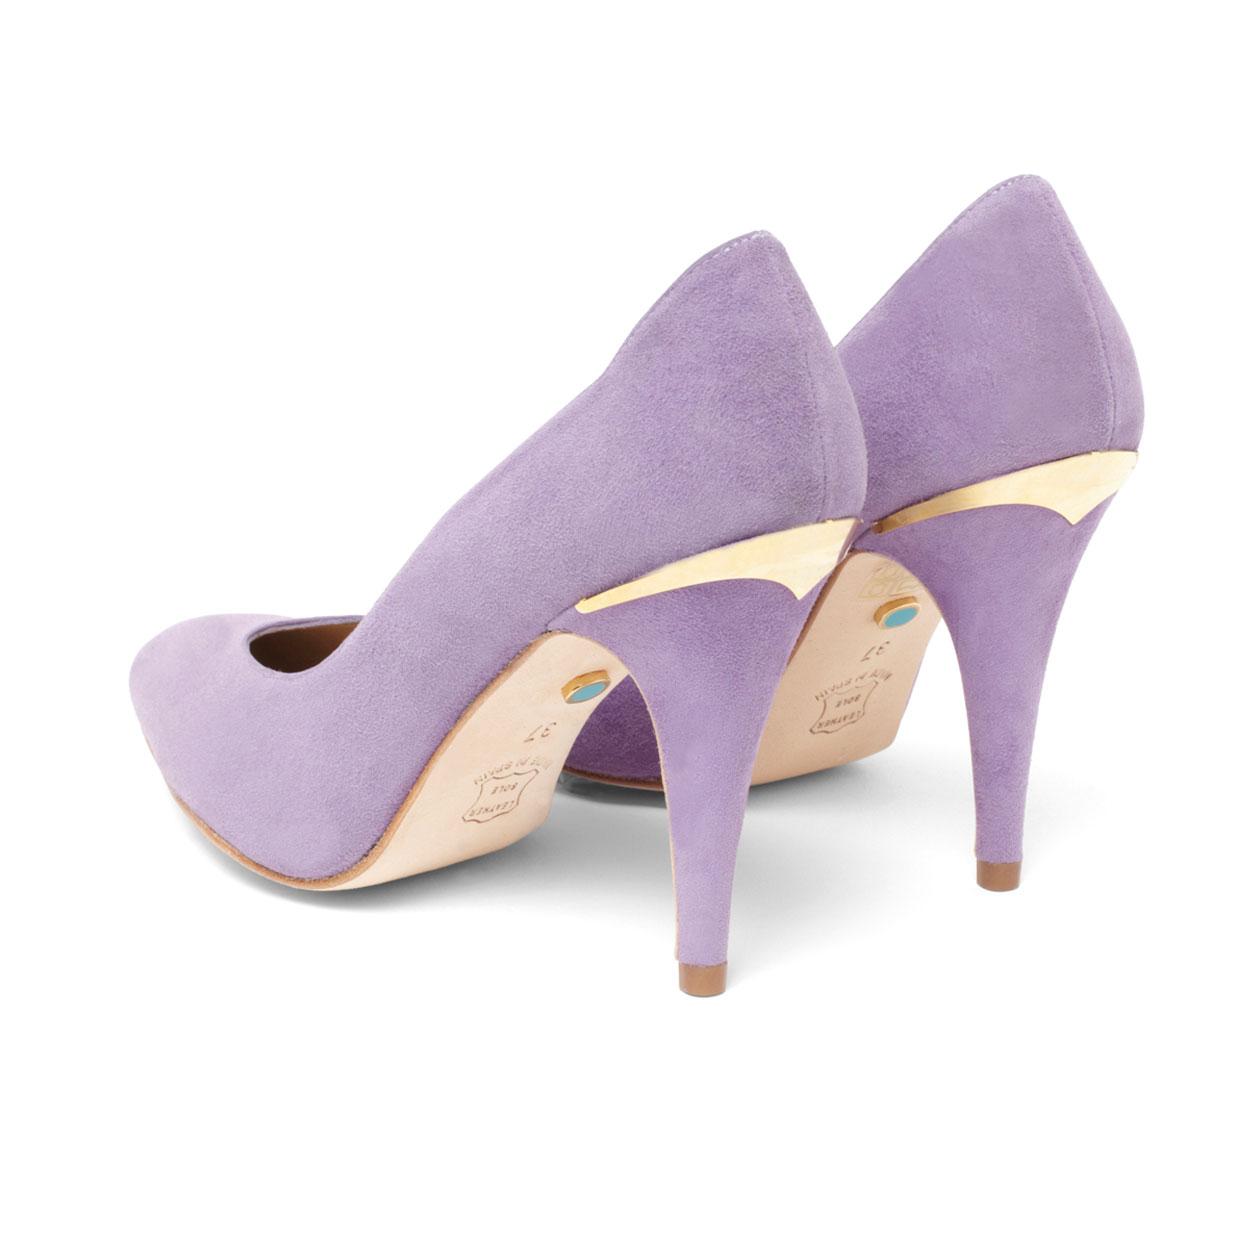 jazz-lilac-pair-back-shoes-shopping-designer-london-heels-cleob.jpg